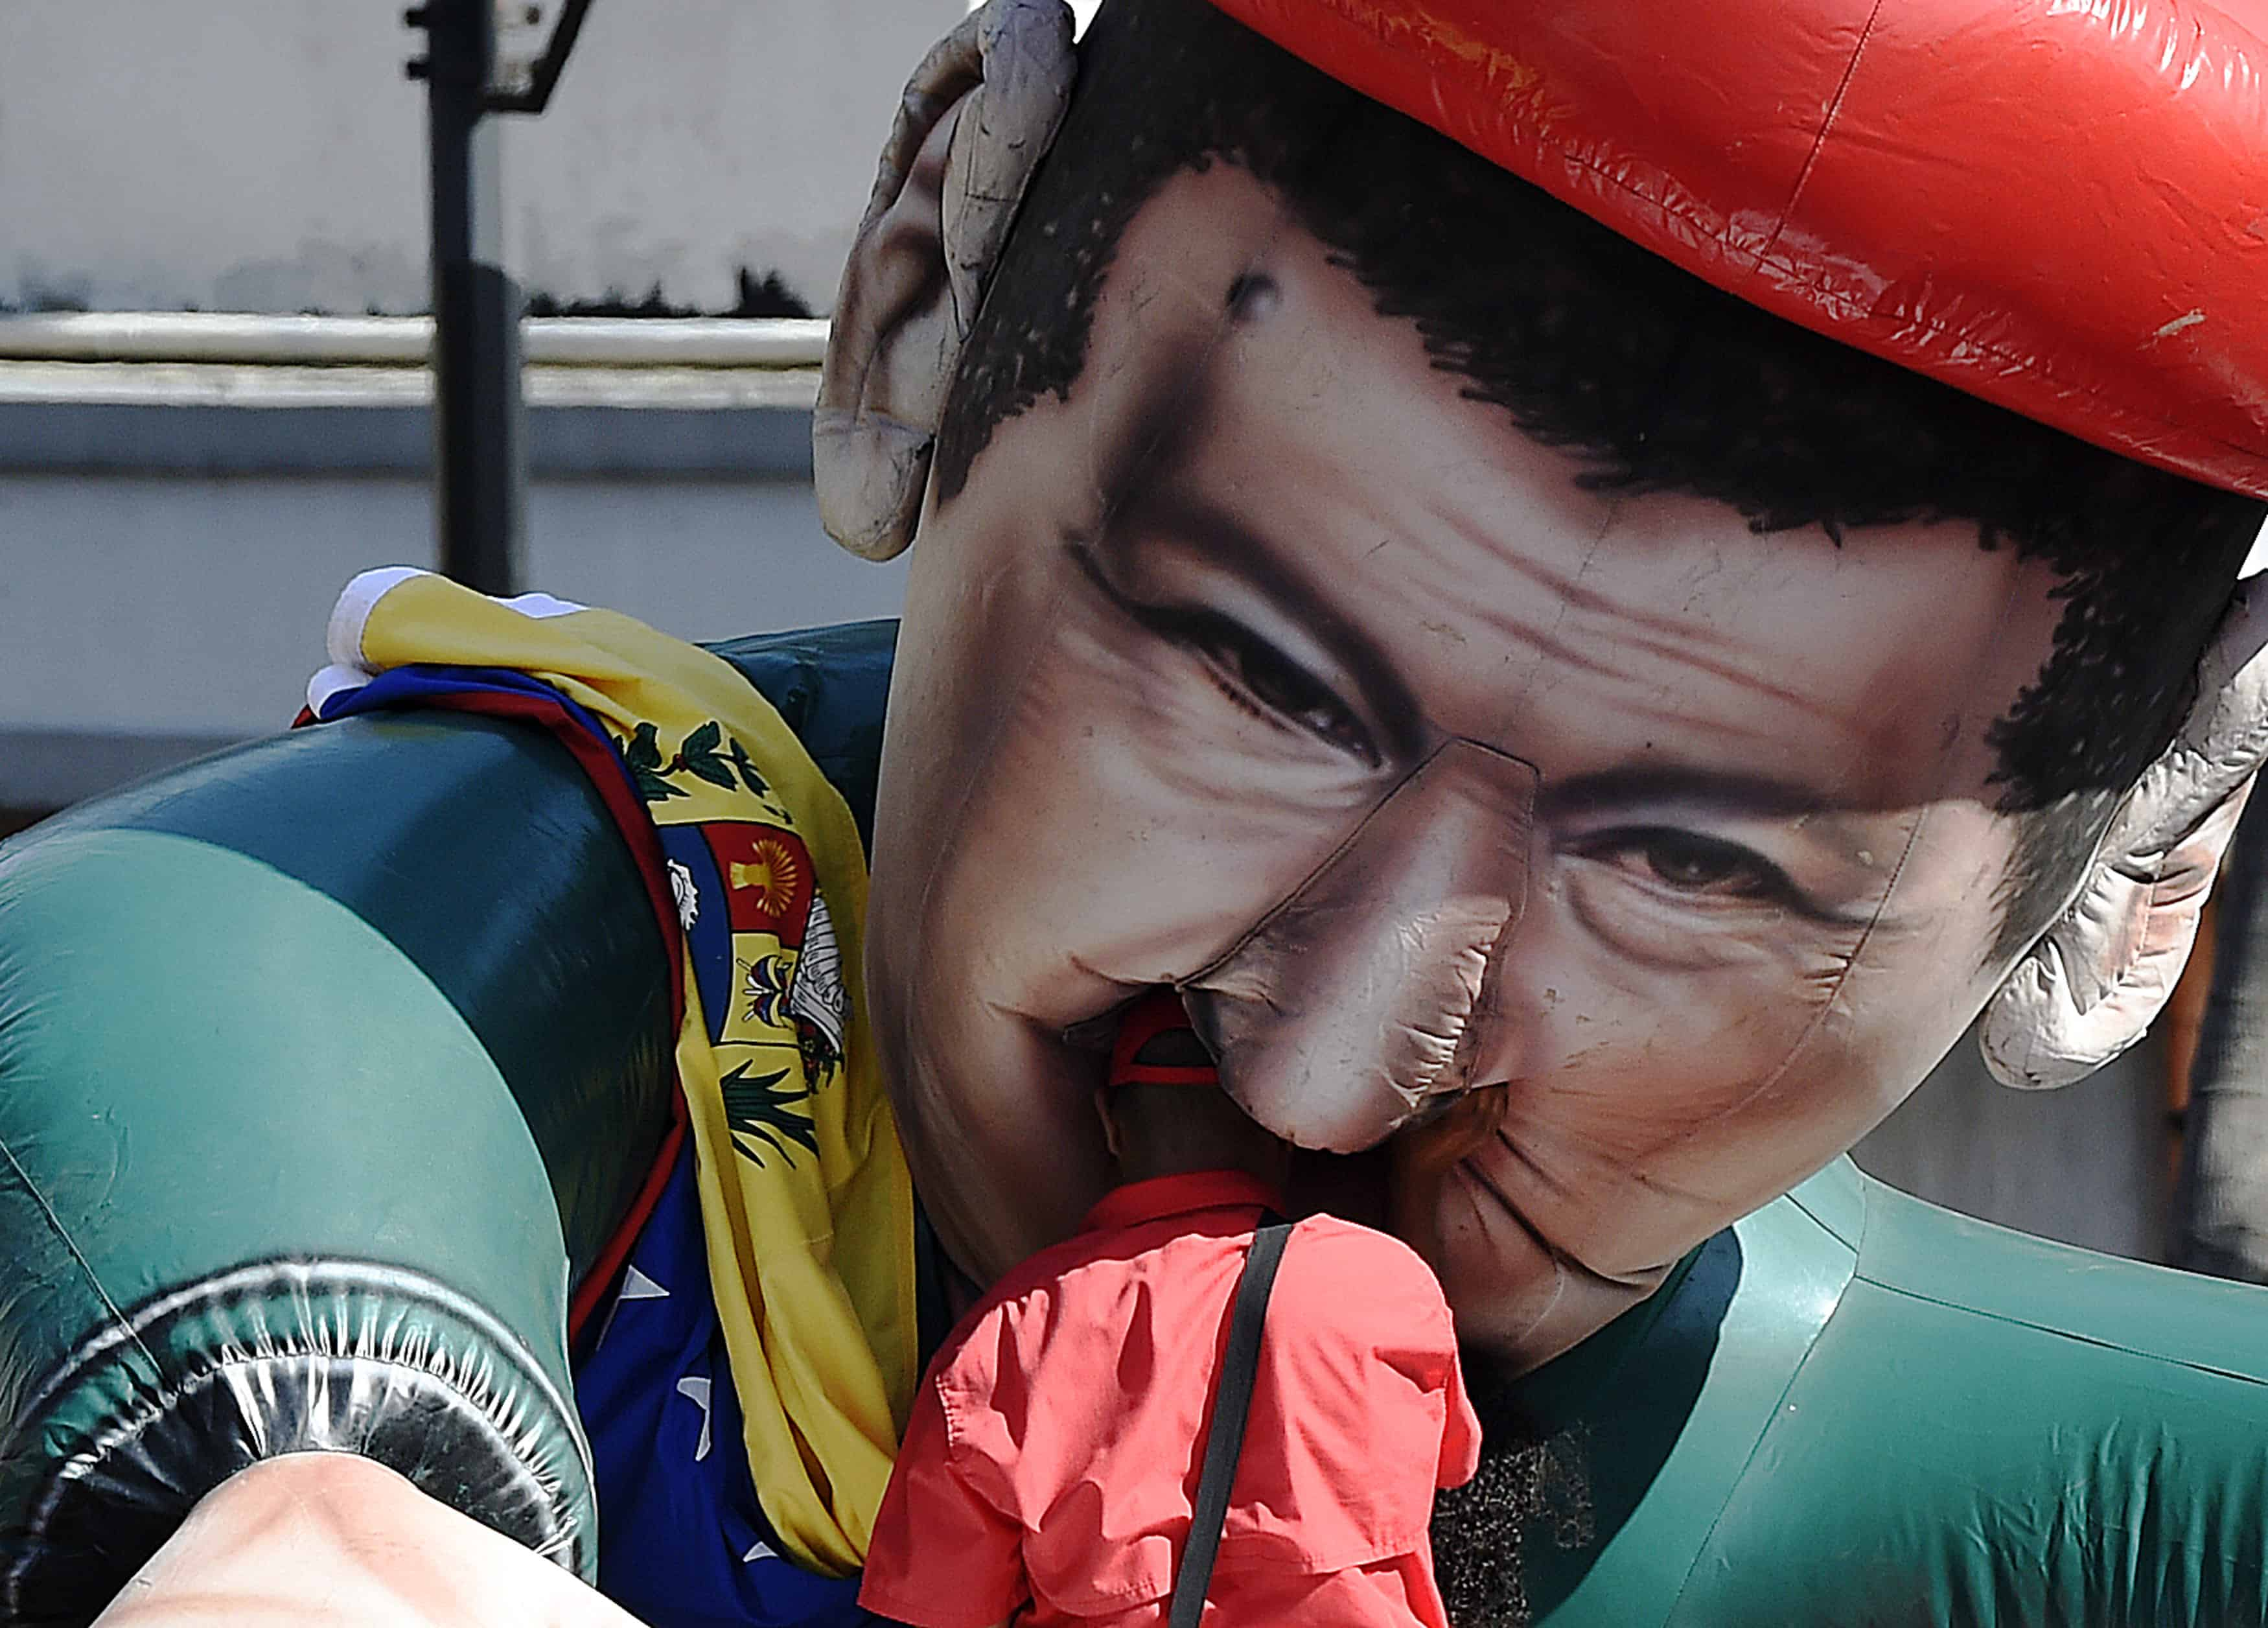 Venezuela crisis: A man and an inflatable doll depicting late Venezuelan President Hugo Chávez